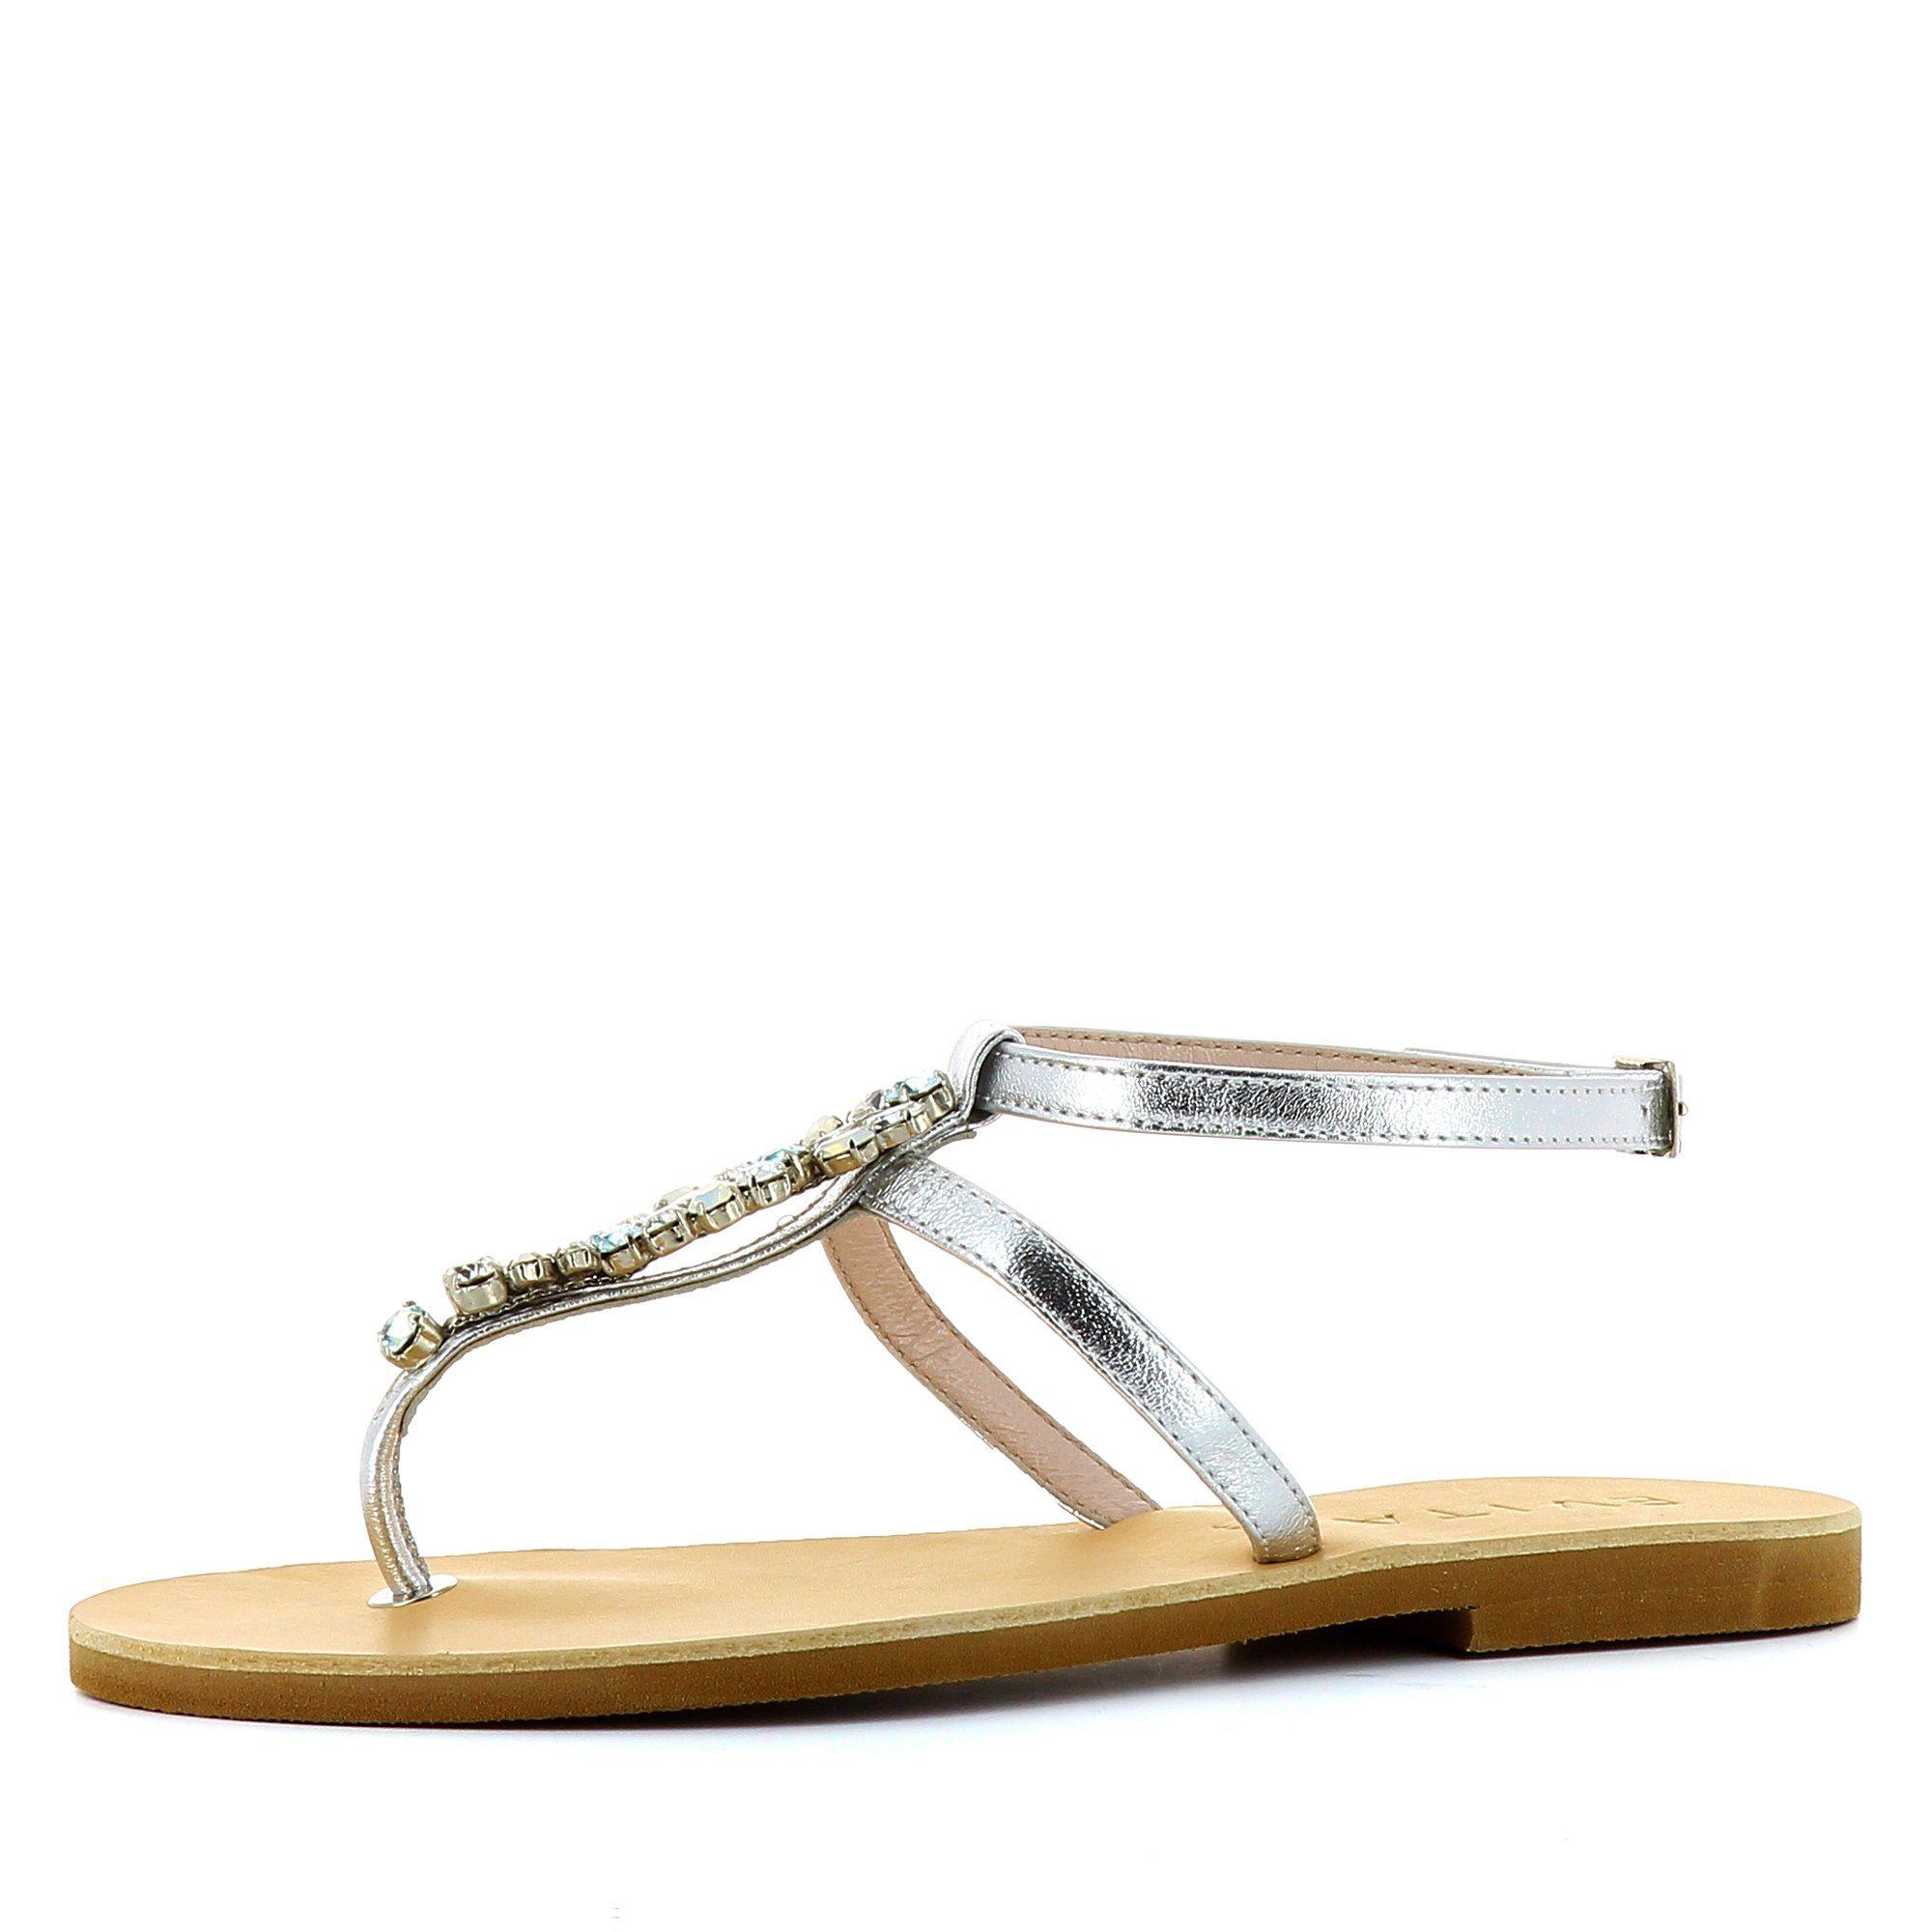 Evita GRETA Riemchensandalette, Sandale kaufen  silberfarben